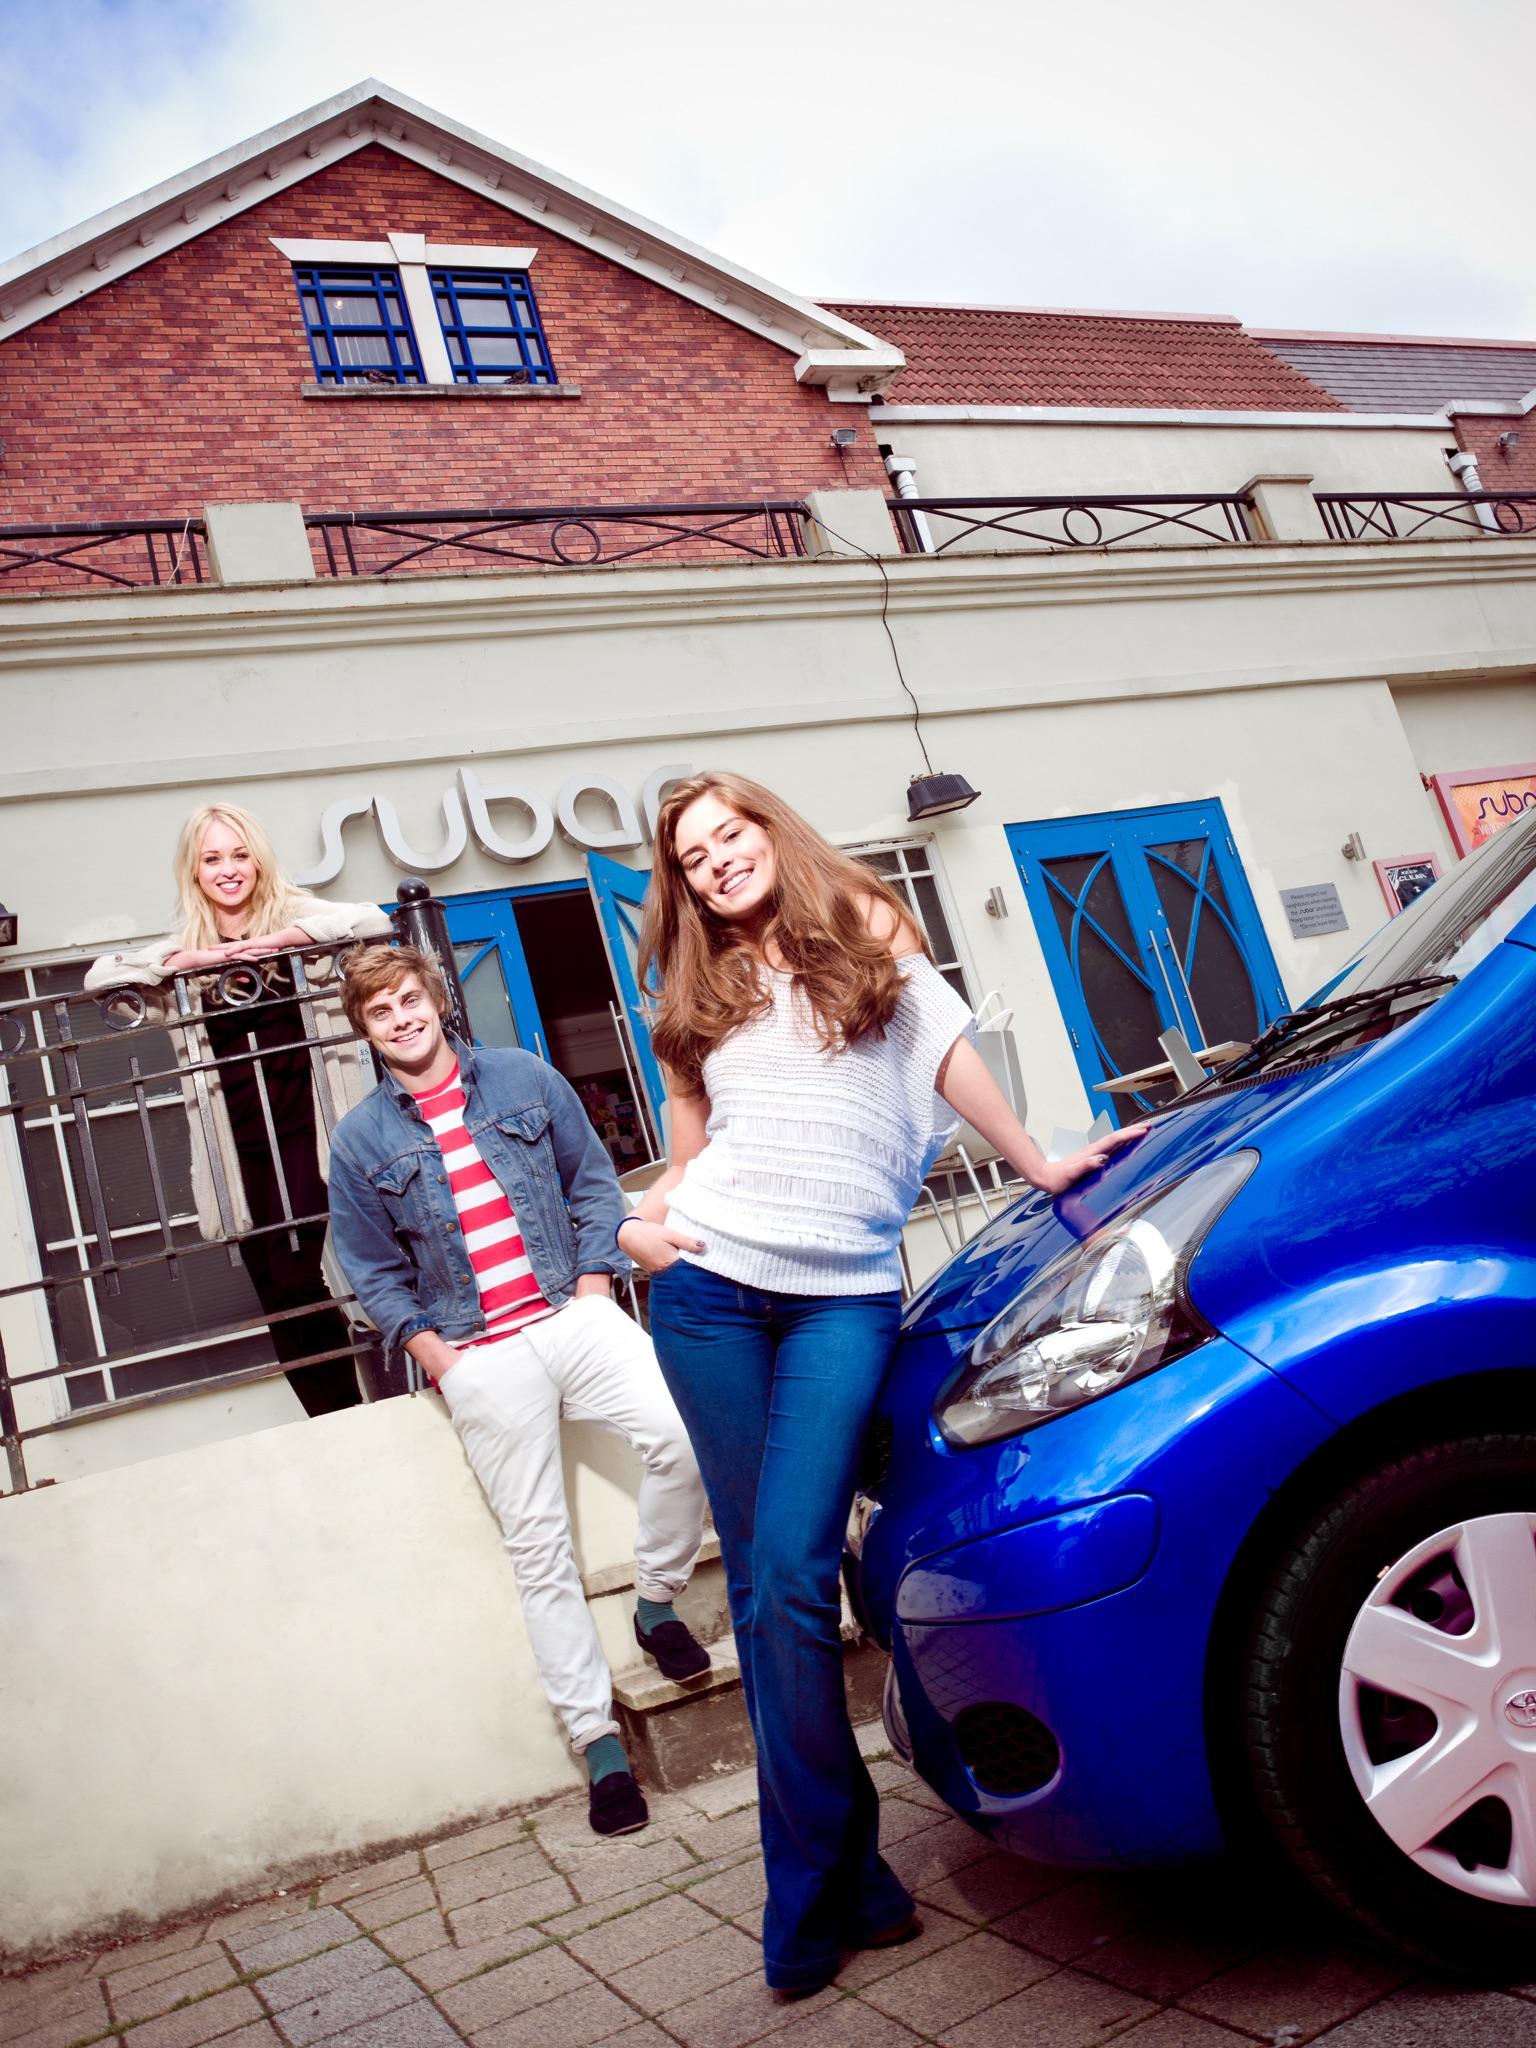 First Car Magazine Editorial Celebrity Photoshoot Editorial Hollyoaks Jorgie Porter James Atherton Rachel Shenton SU Bar Jay McLaughlin